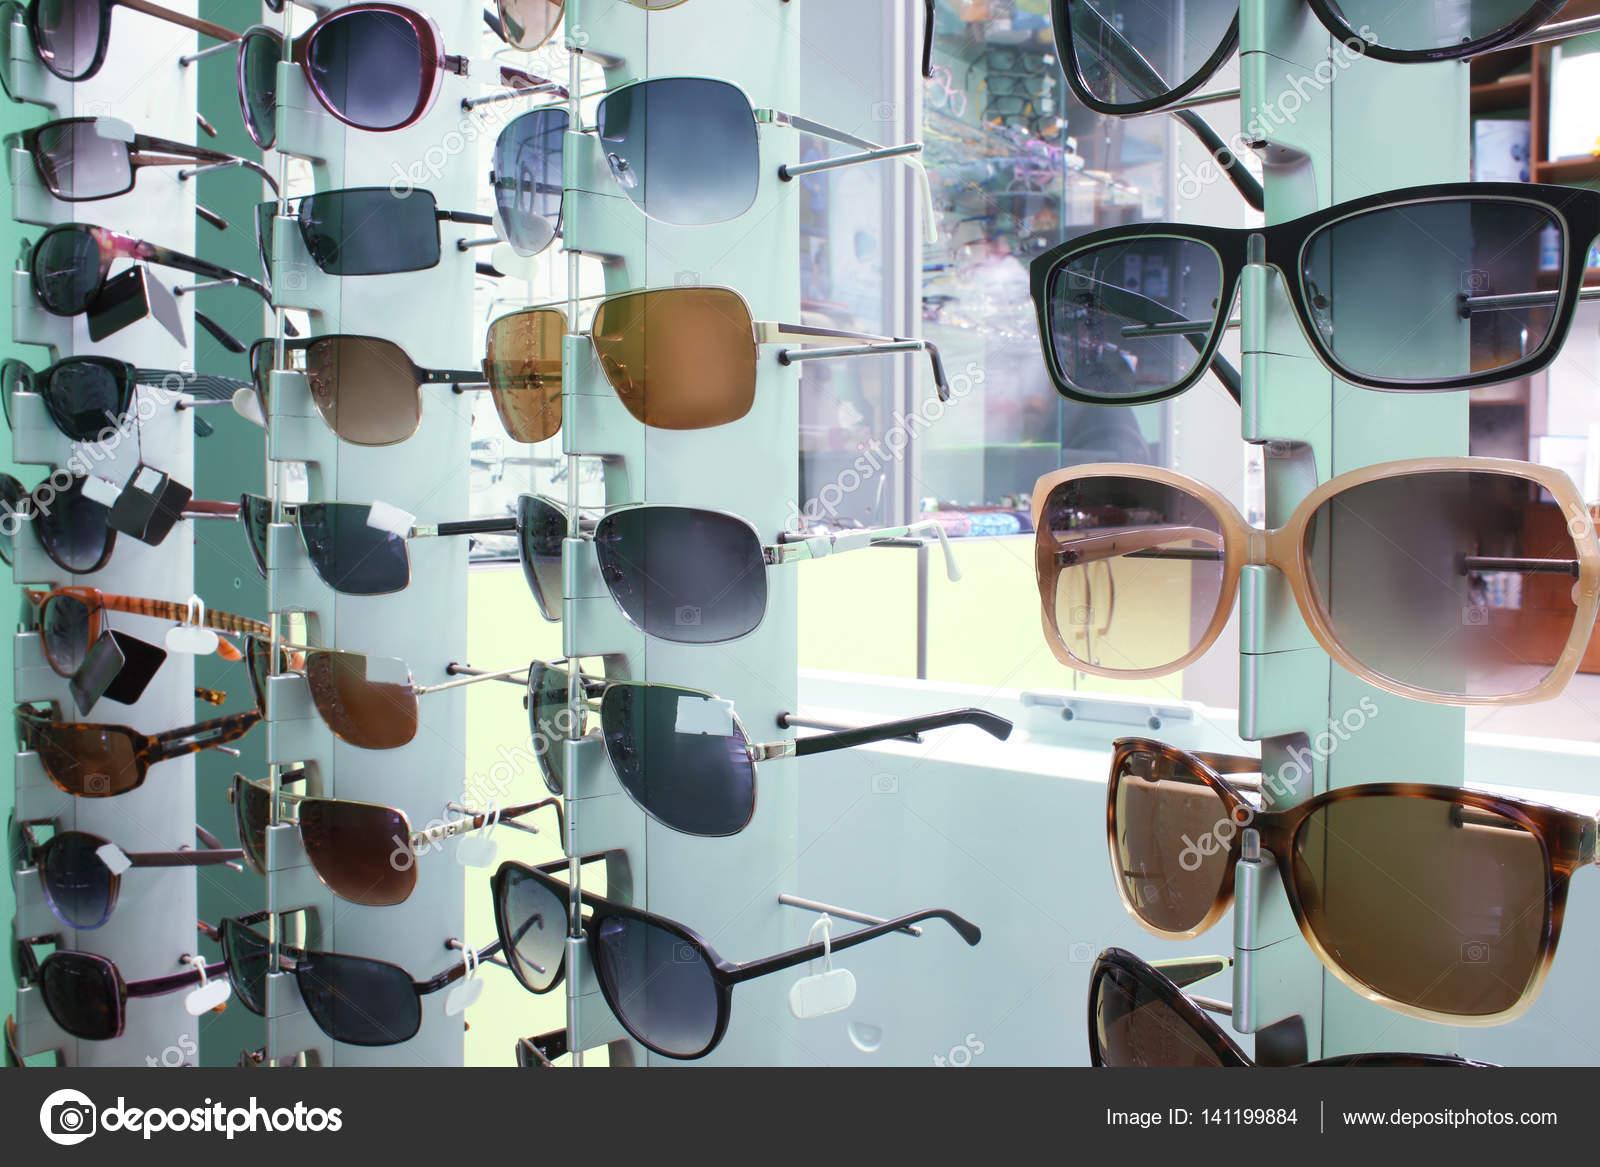 fa36e7f67d Βιτρίνα από διαφορετικά κομψά γυαλιά στο κατάστημα — Εικόνα από ...